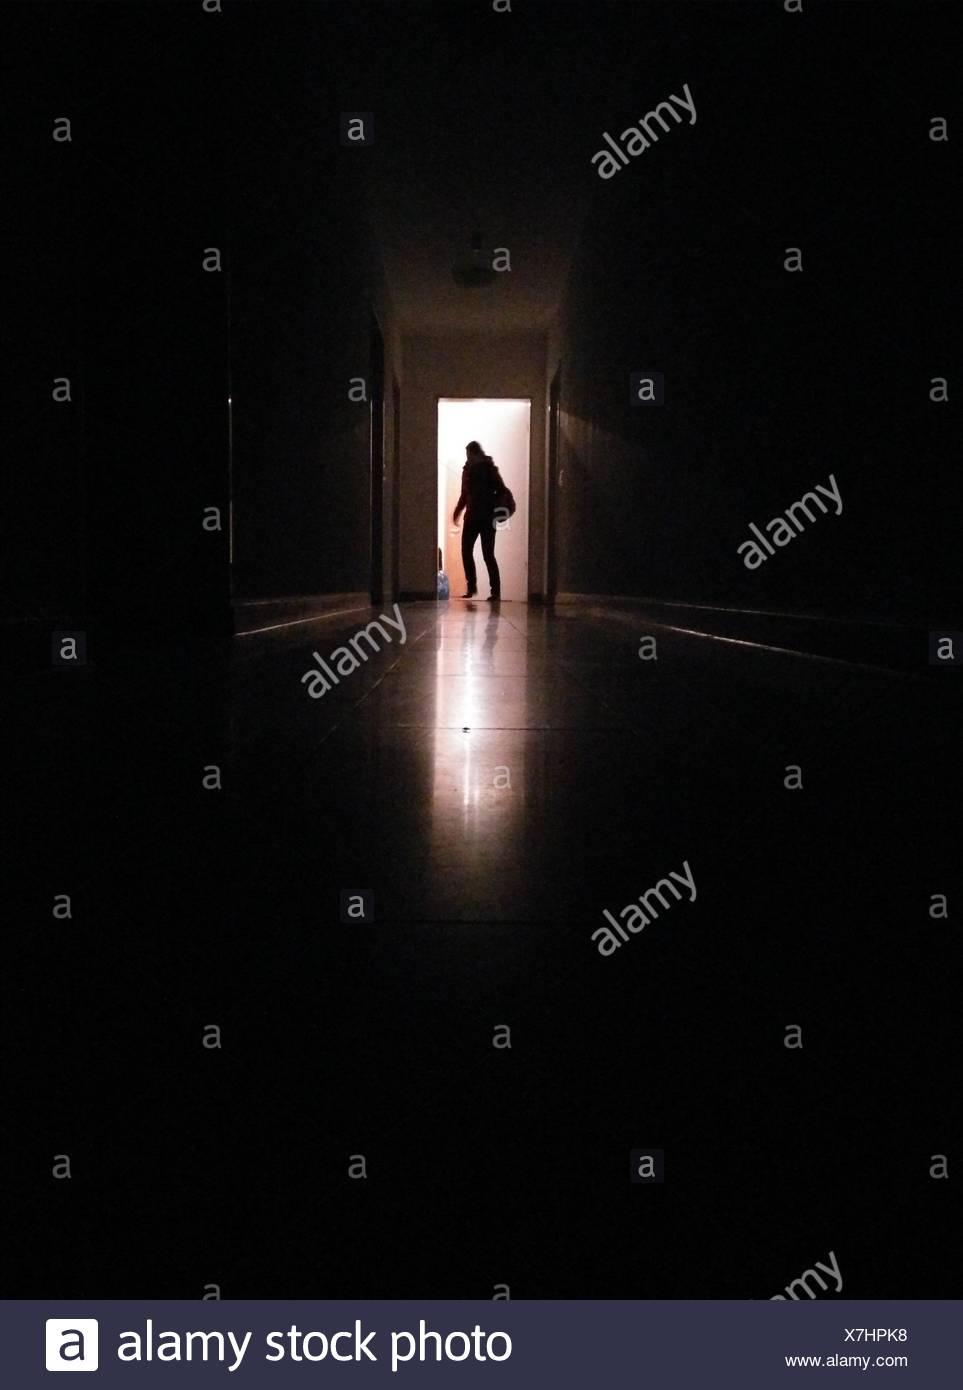 Silhouette Person im Korridor beleuchteten Raum betreten Stockbild